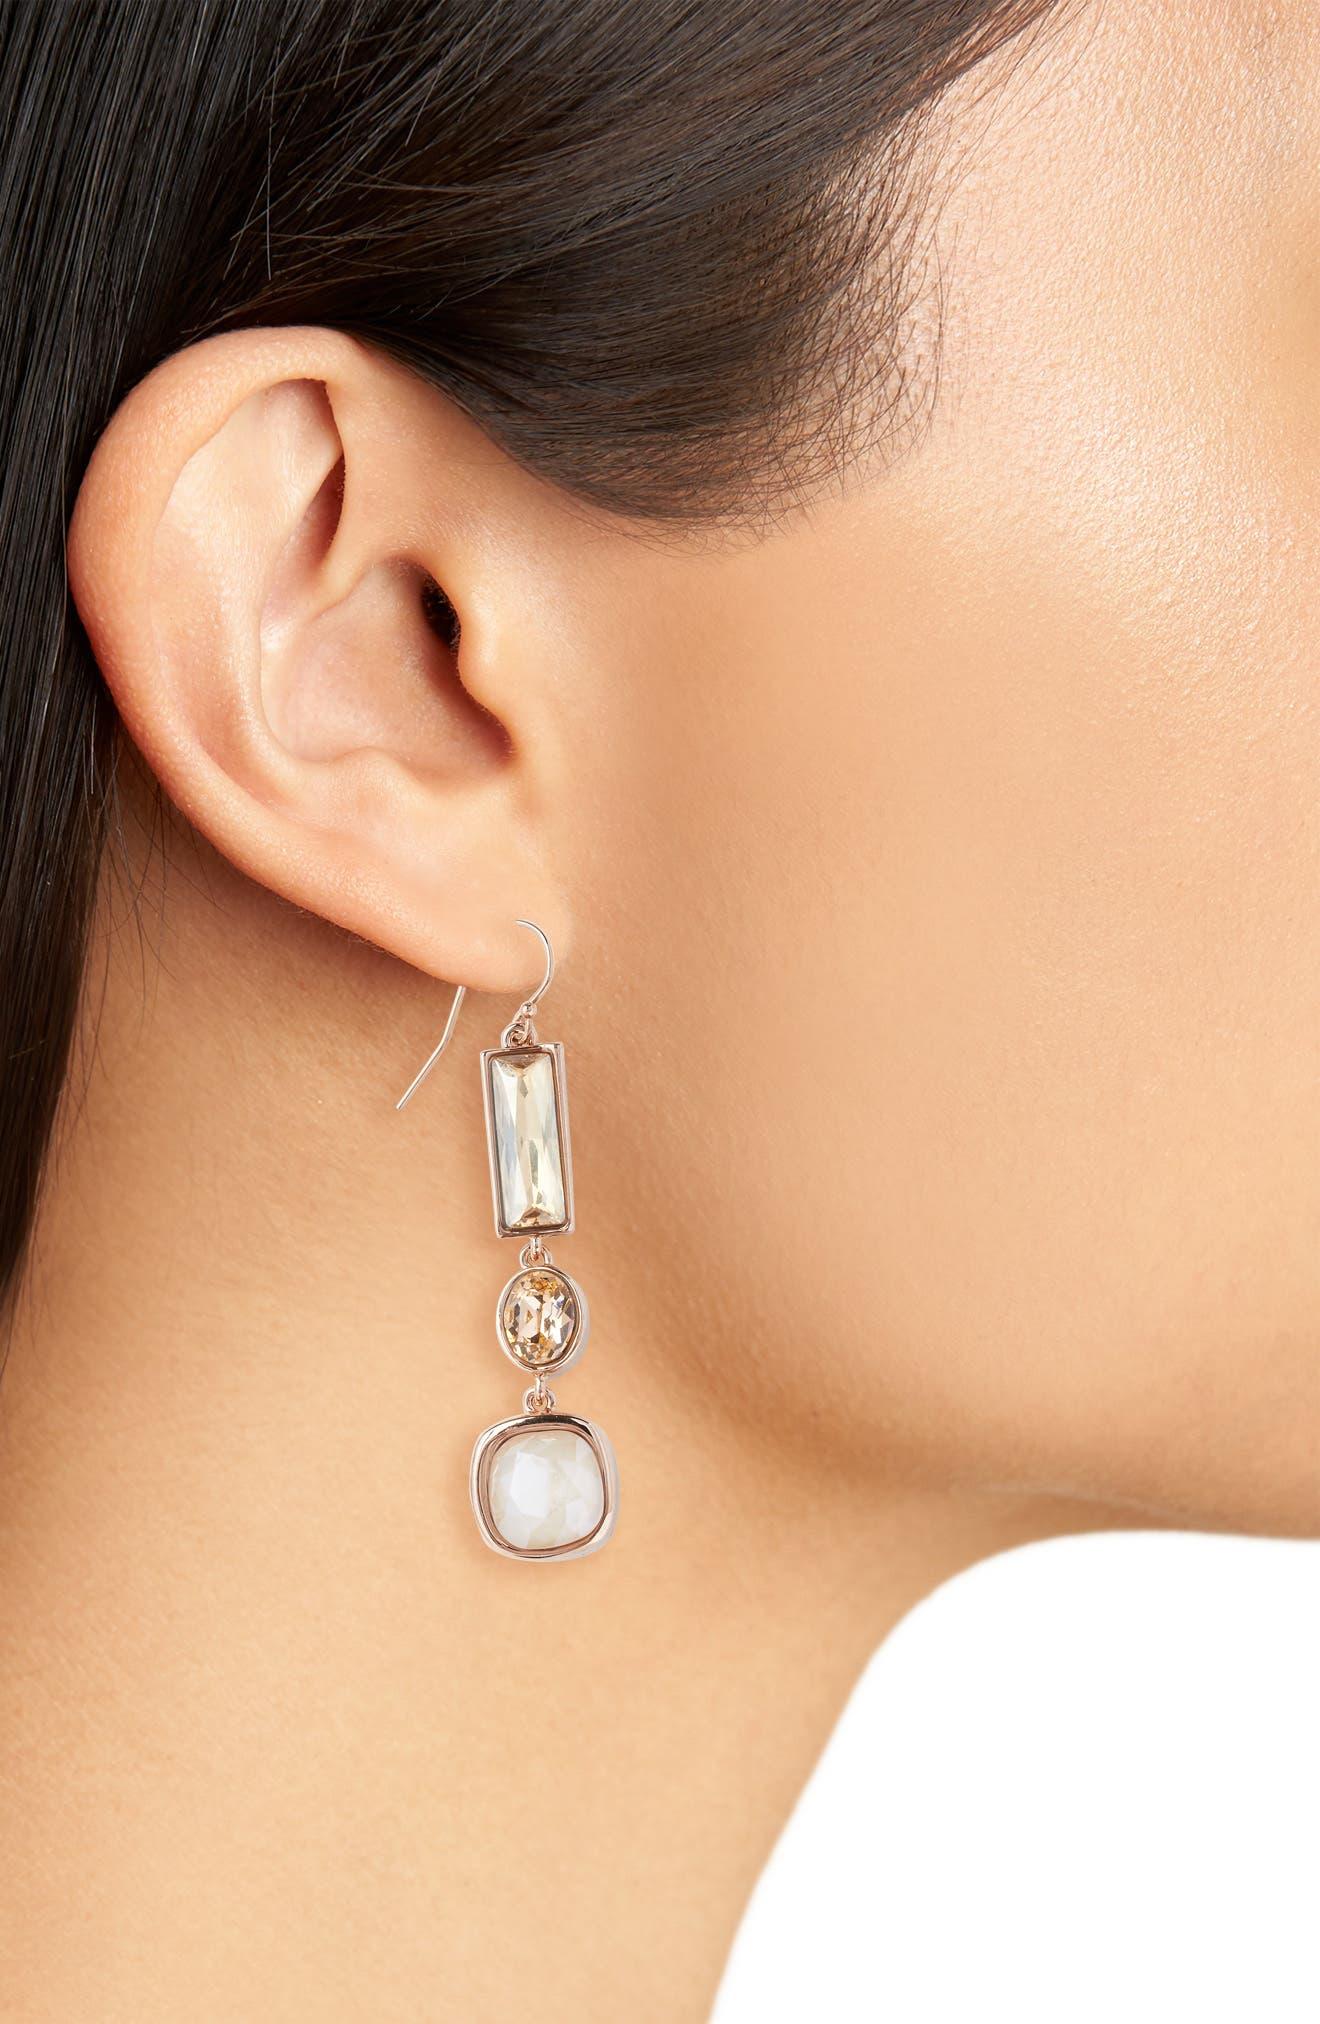 Swarovski Crystal Drop Earrings,                             Alternate thumbnail 2, color,